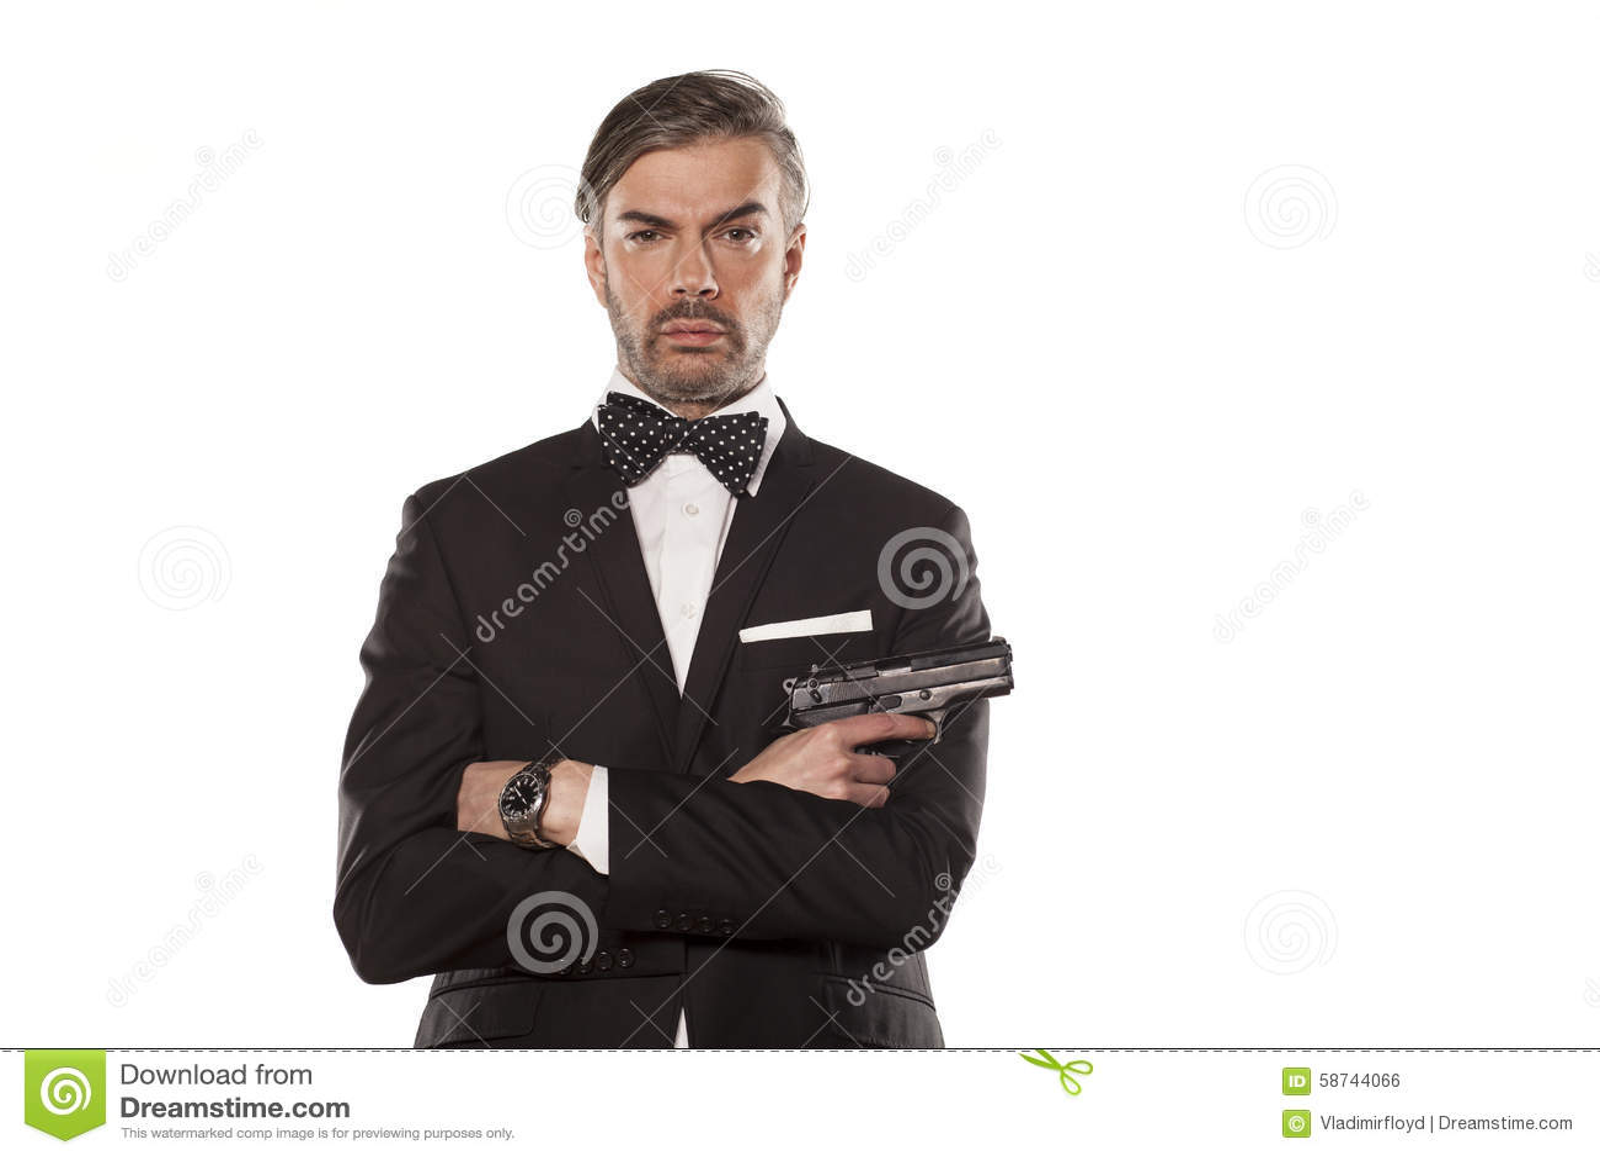 a62bea58ab8a Άτομο σε ένα κοστούμι με ένα πυροβόλο όπλο Στοκ Εικόνες - εικόνα από ...